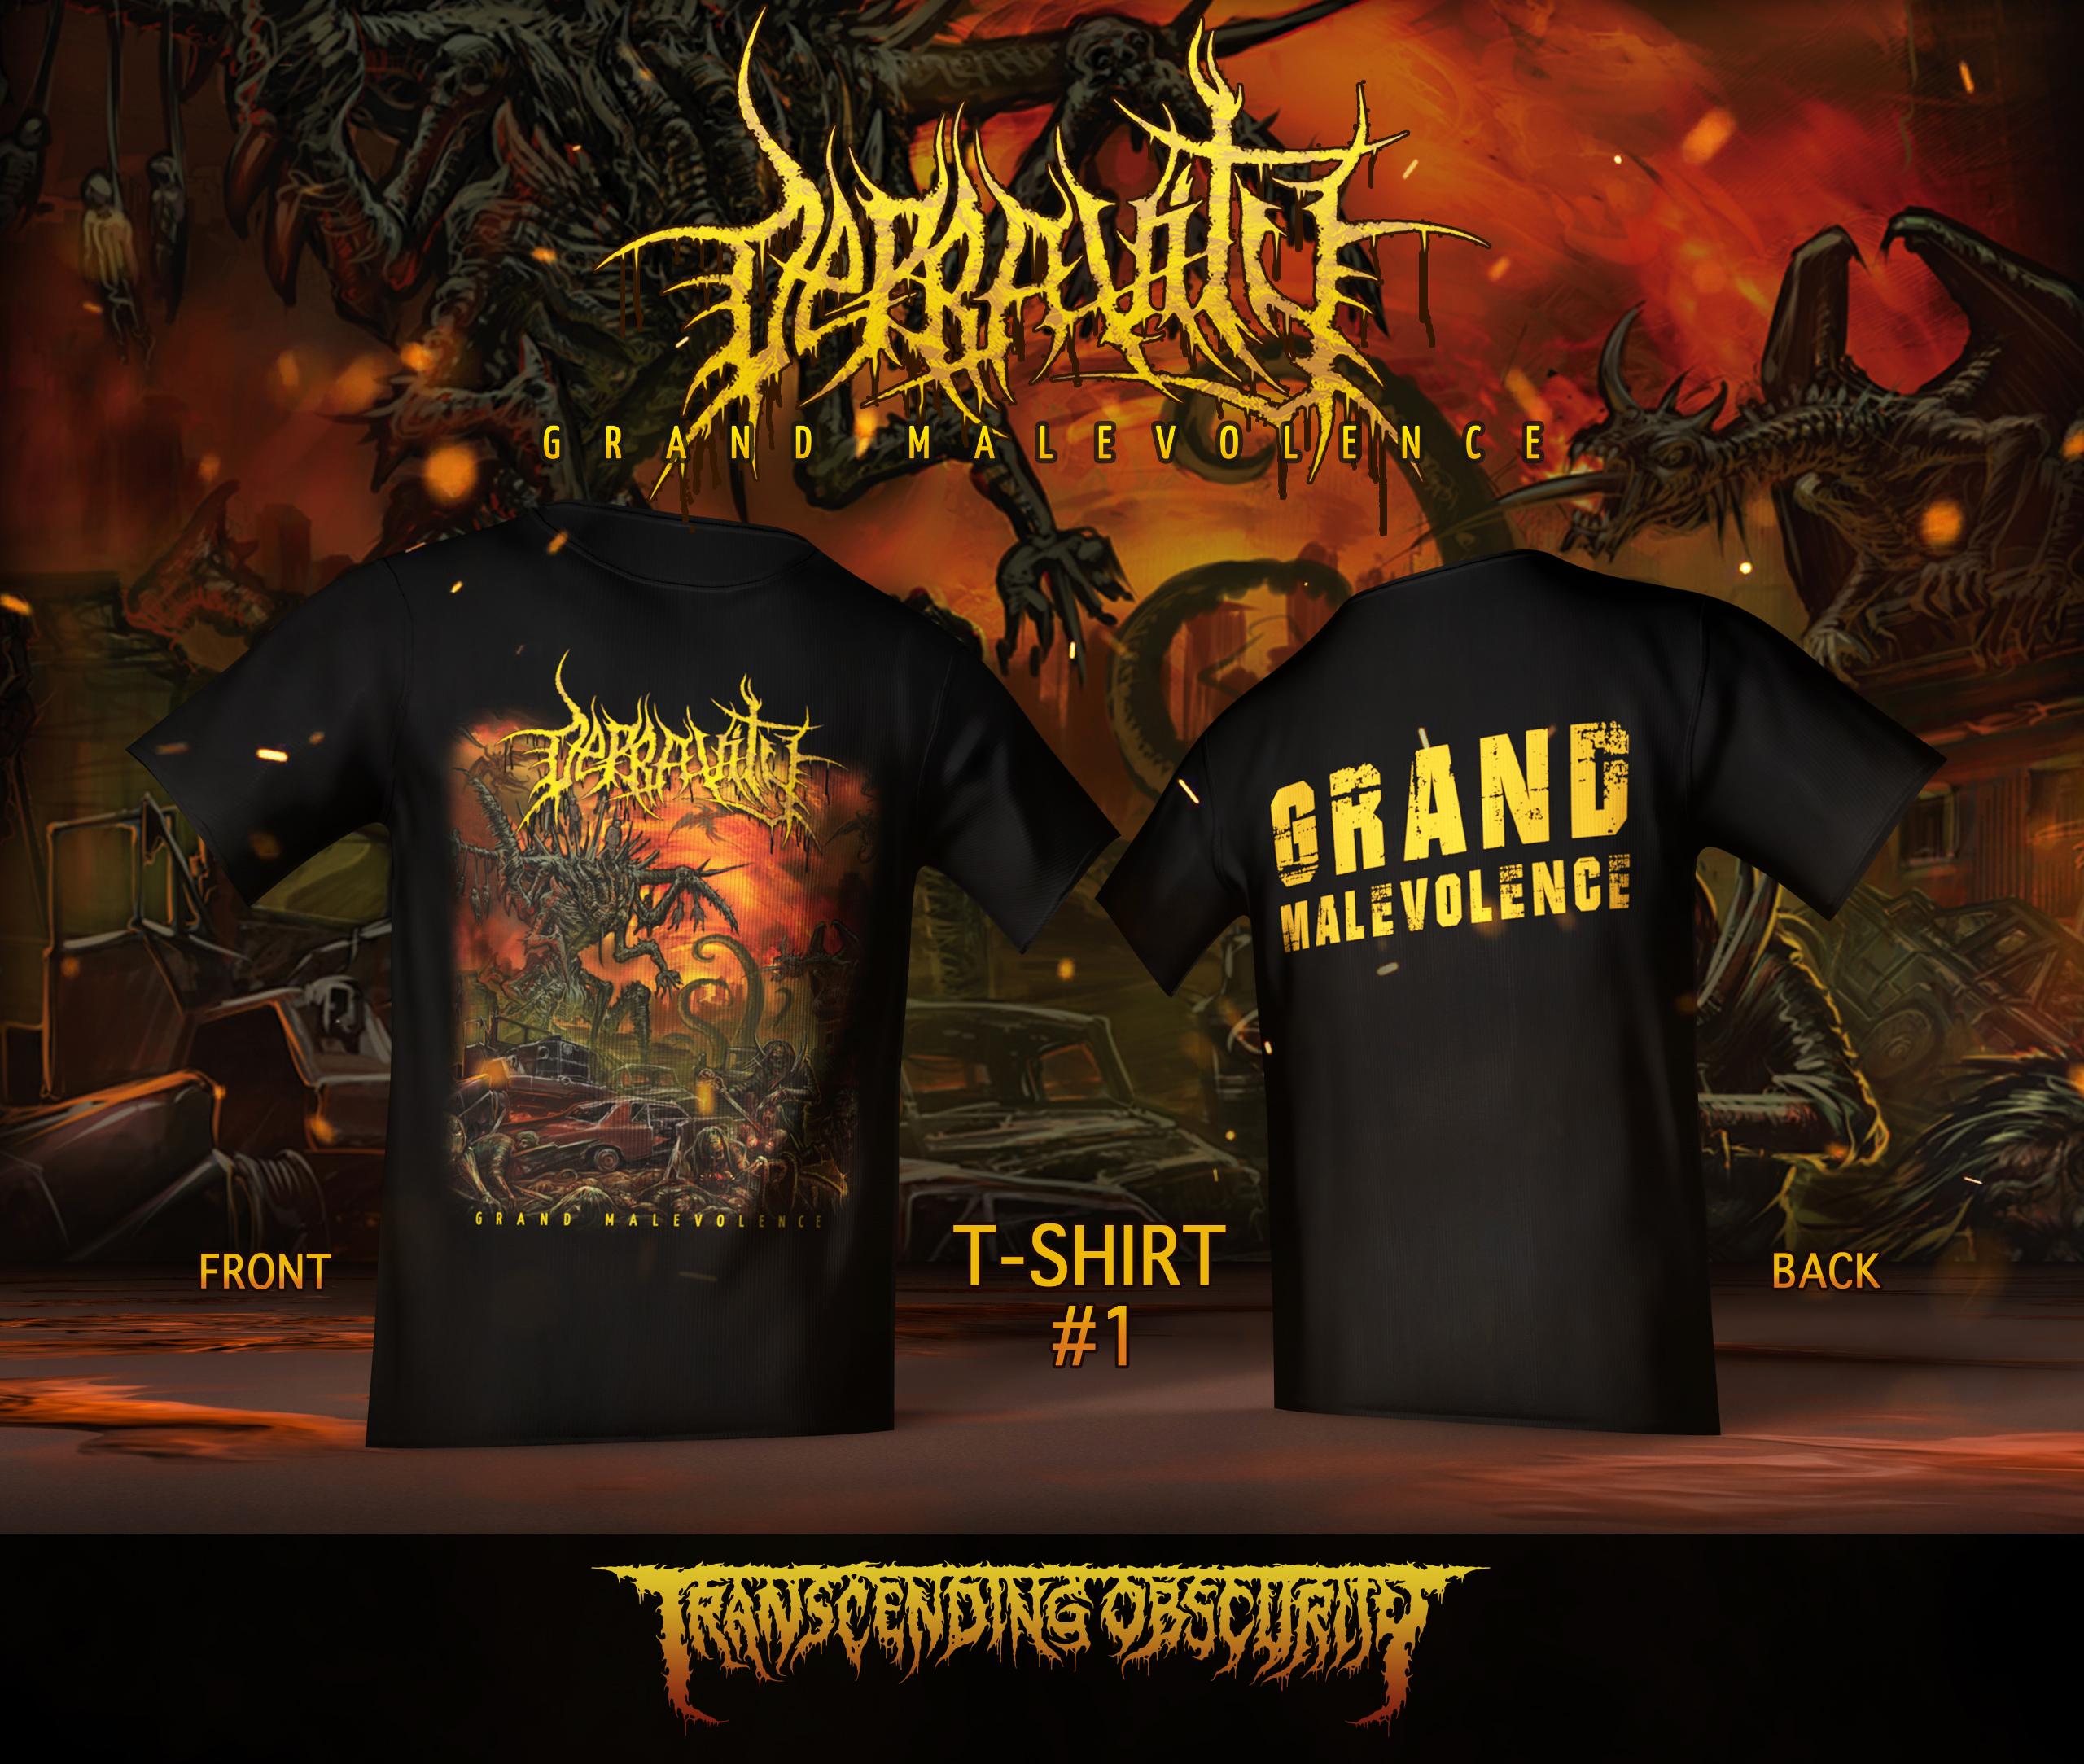 DEPRAVITY 'Grand Malevolence' Front Back Print T-shirt Variant #1